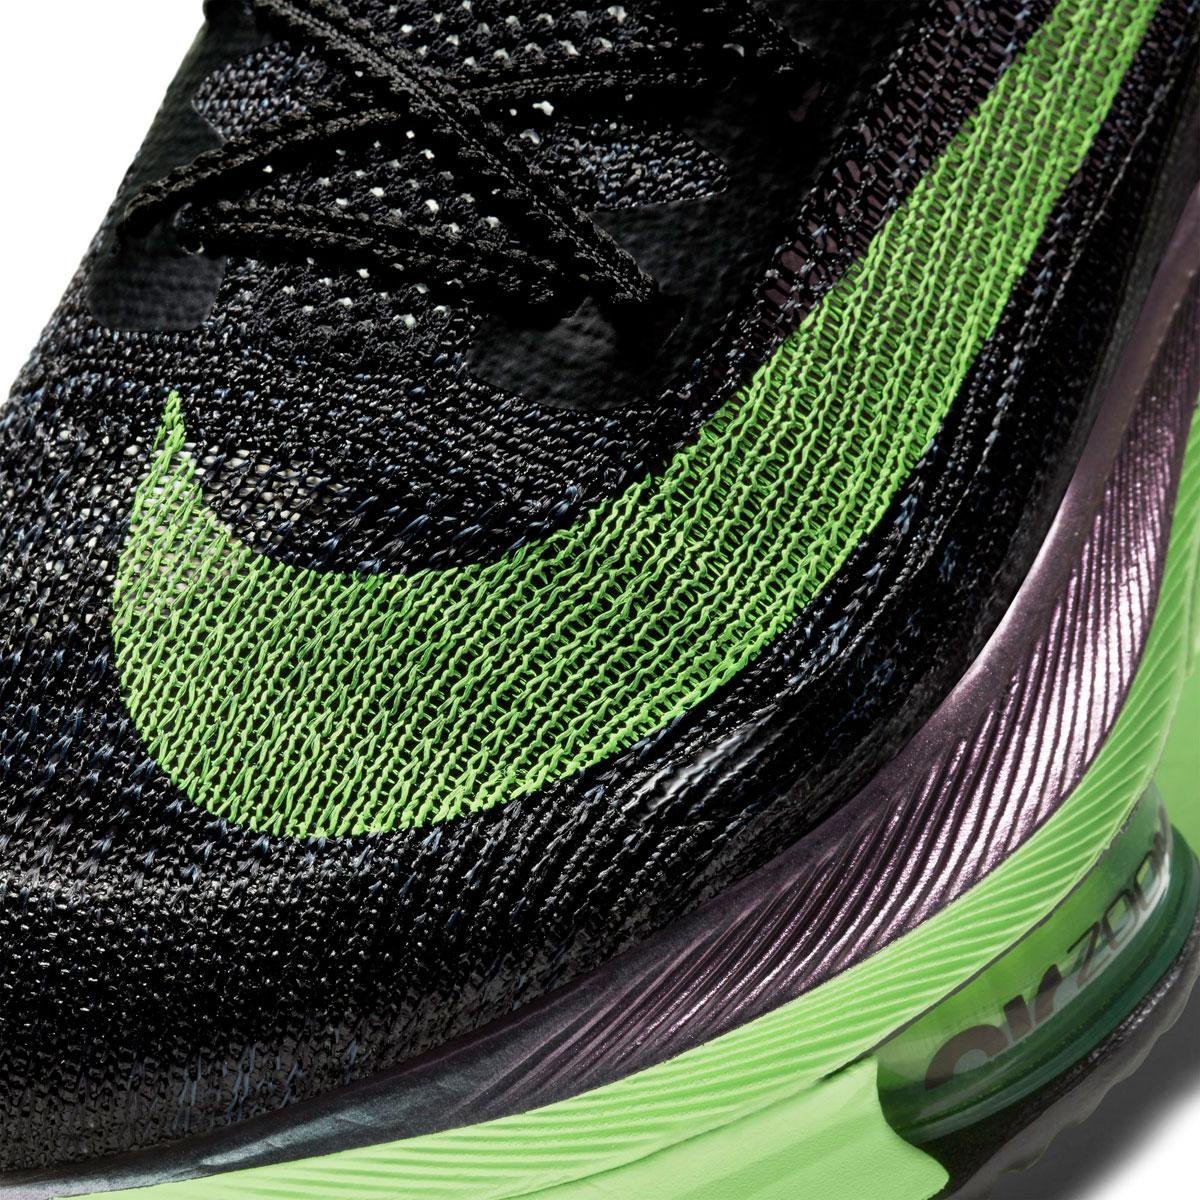 Men's Nike Air Zoom Alphafly Next% Running Shoe - Color: Black/Lime Blast - Size: 6 - Width: Regular, Black/Lime Blast, large, image 7